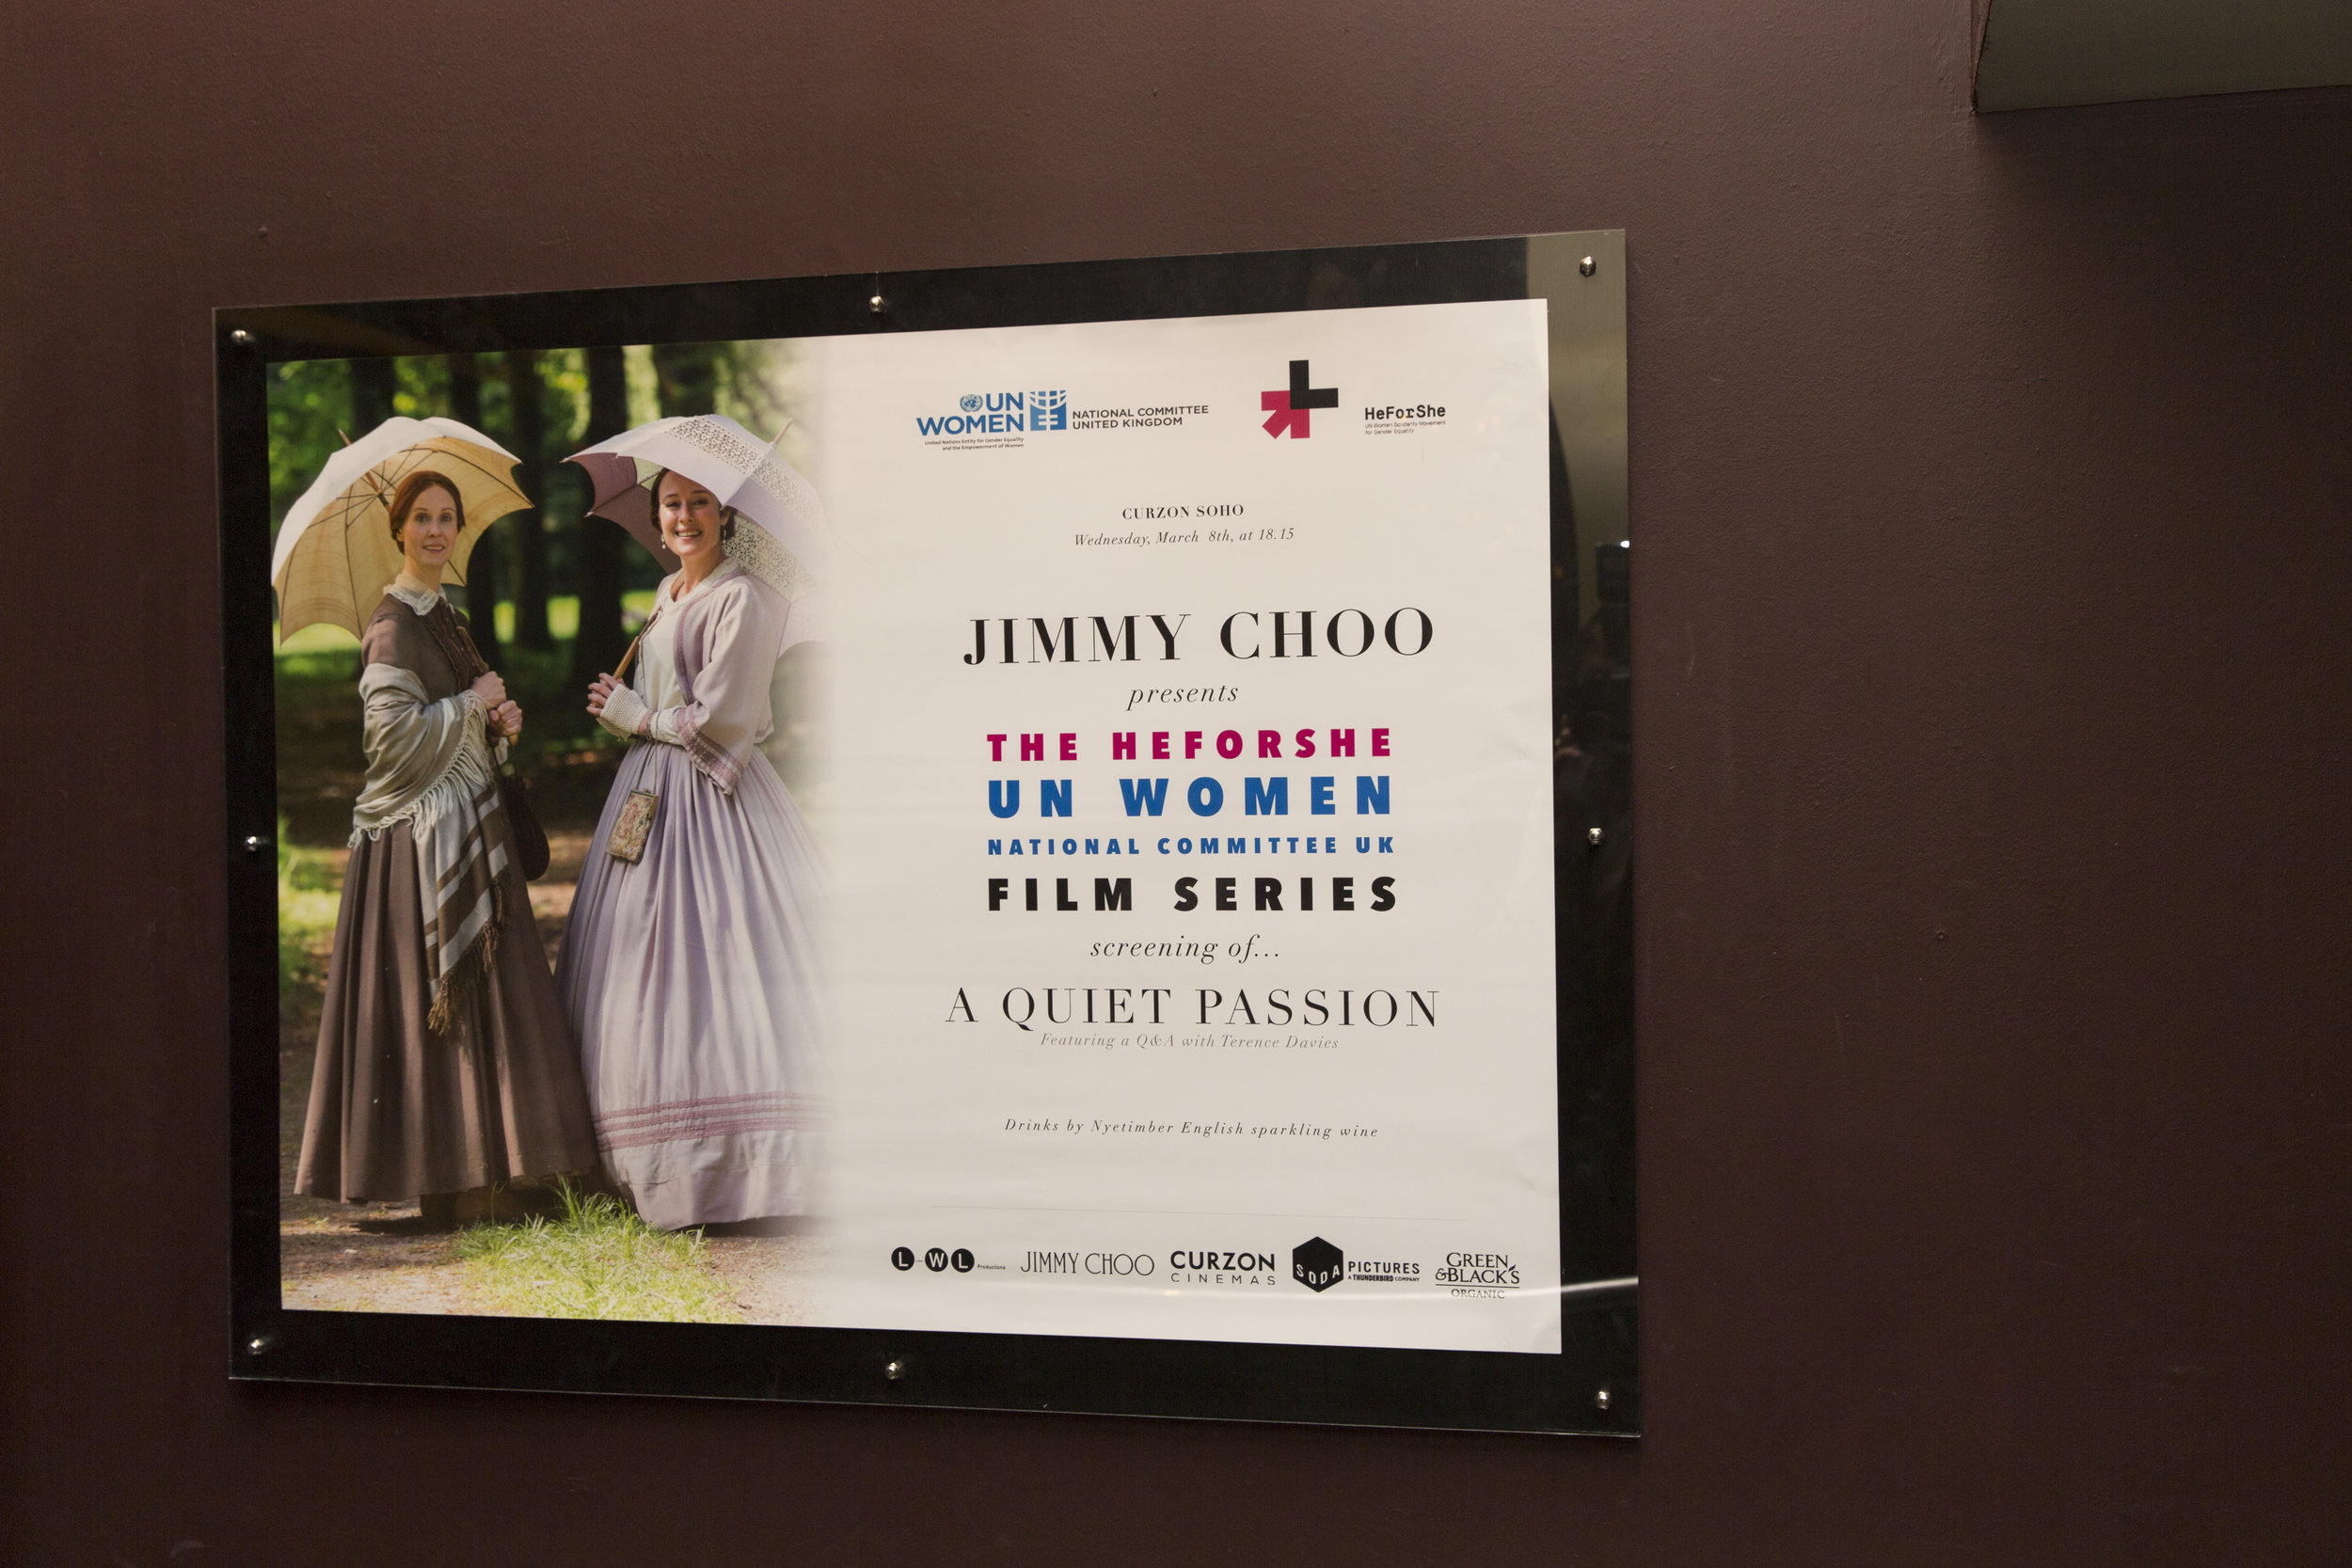 long-winded-lady-productions-un-women-41.jpg